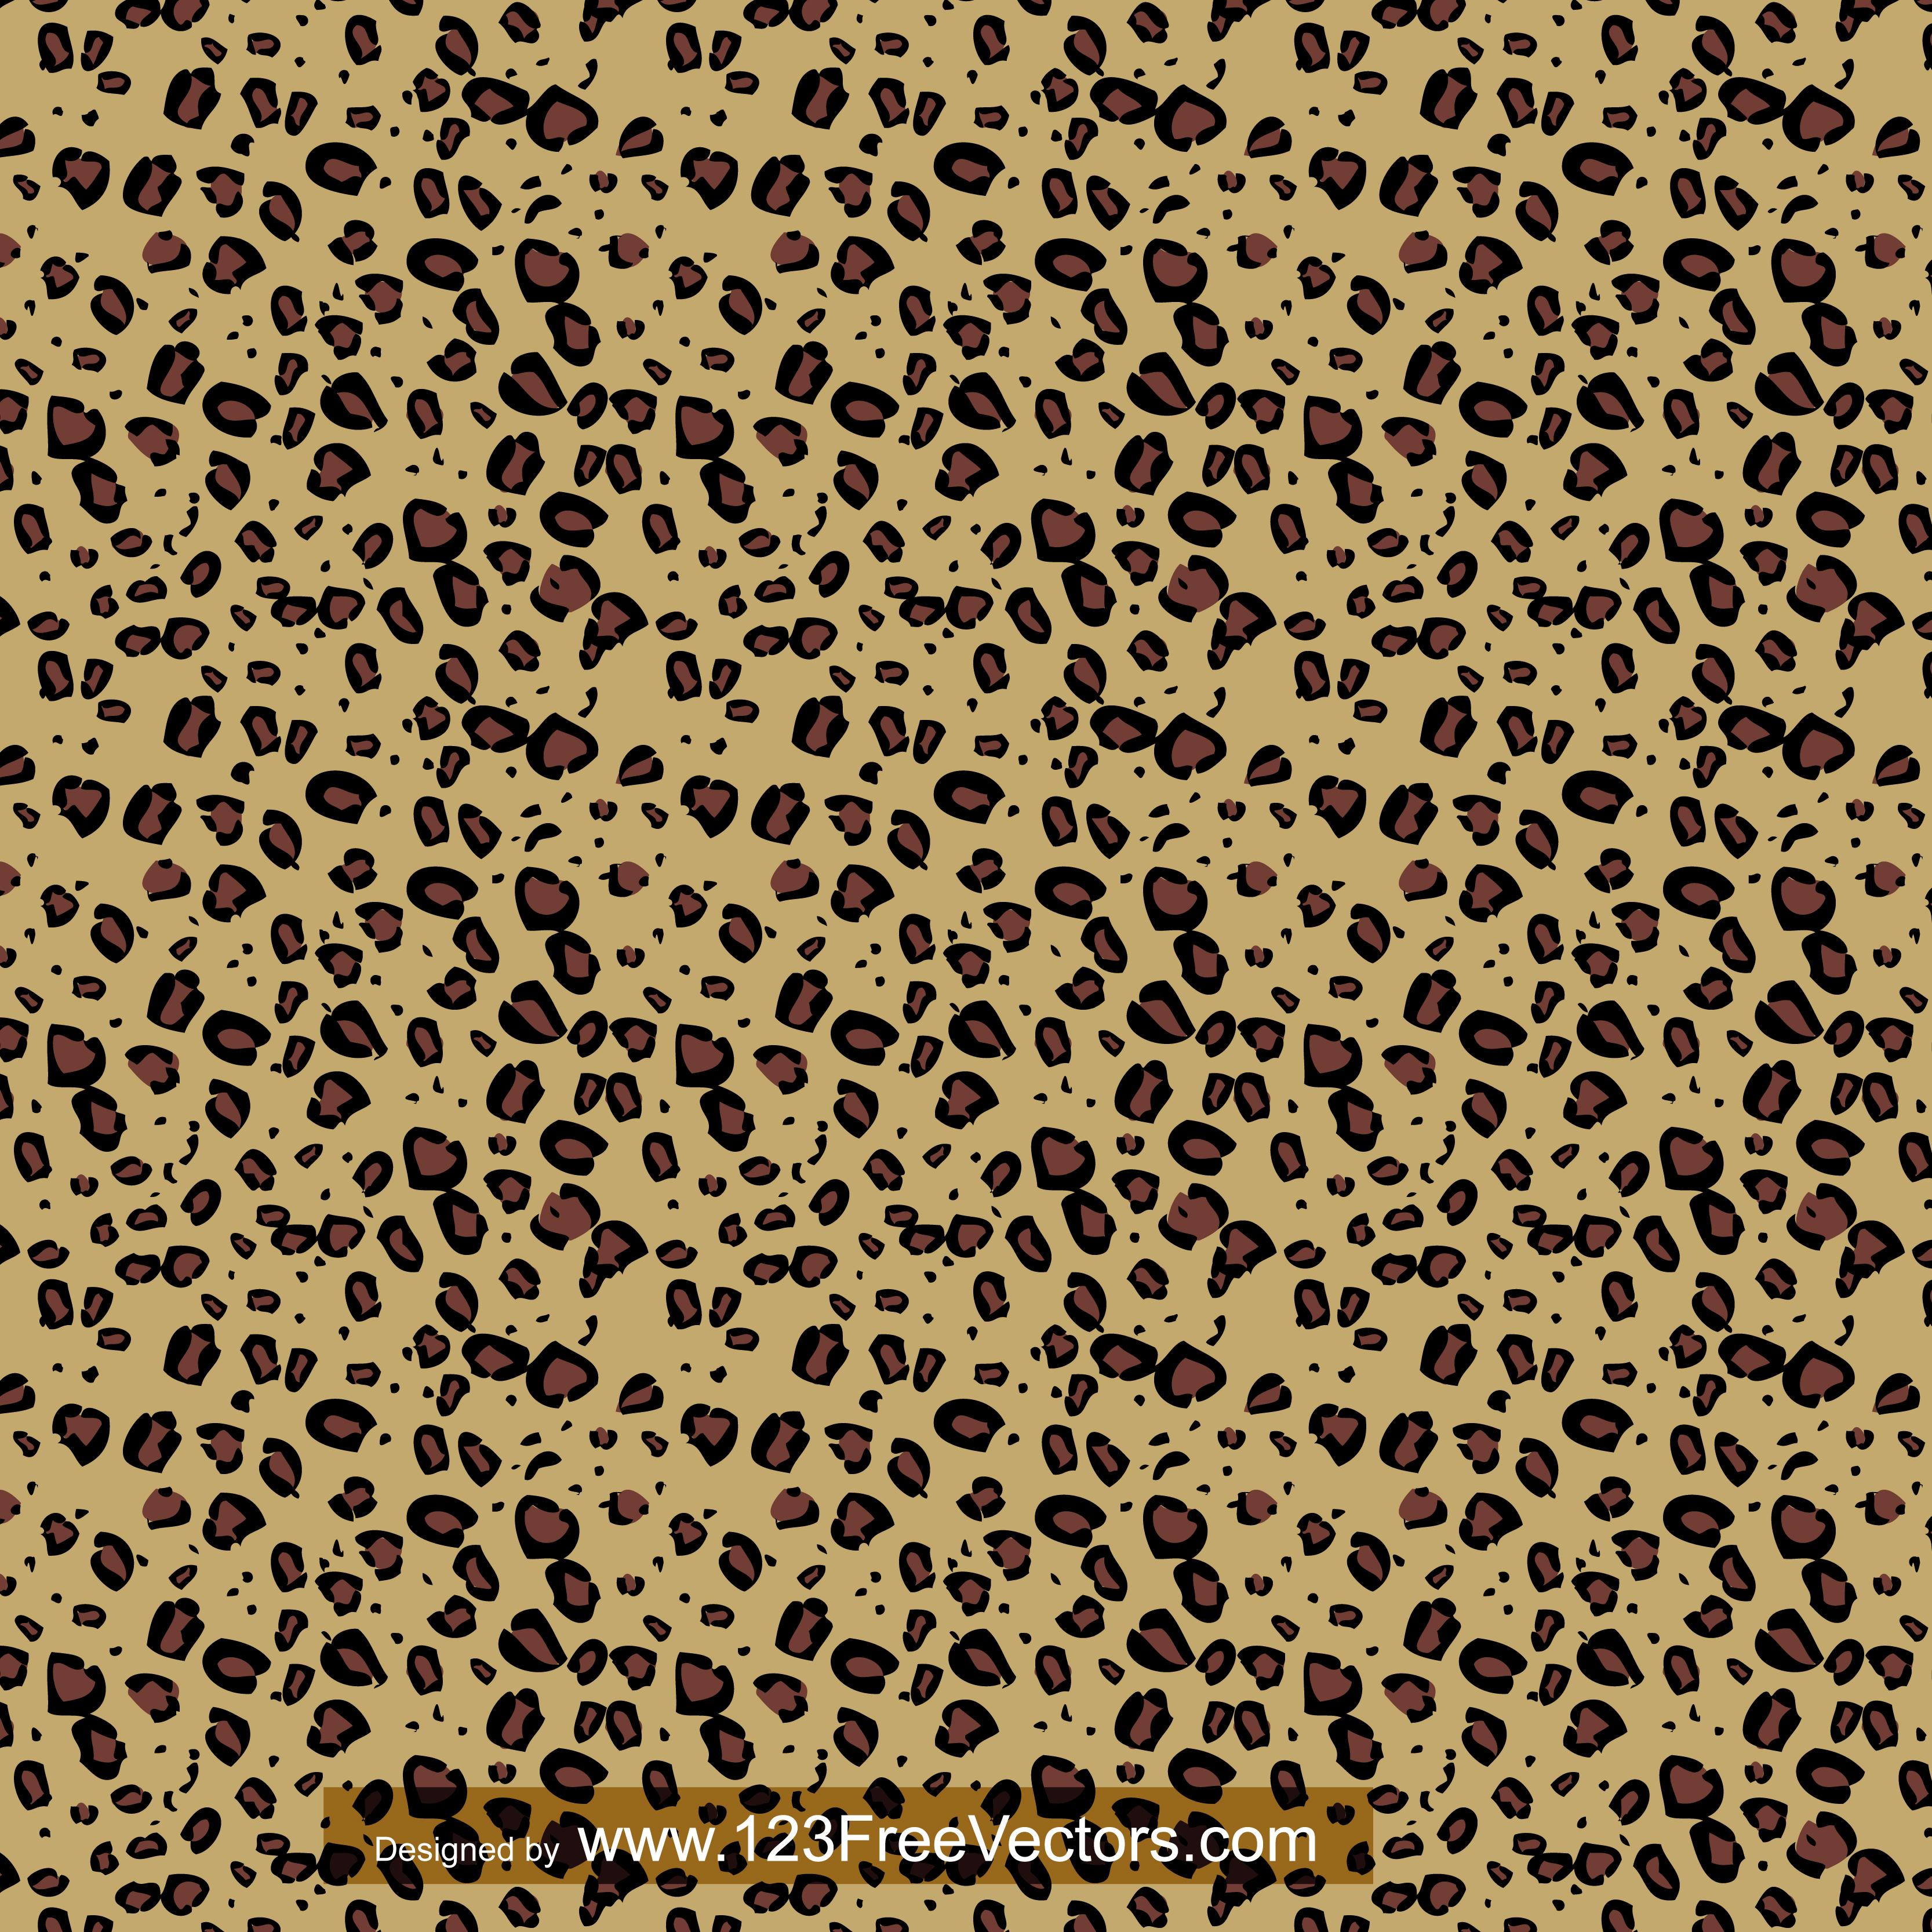 3333x3333 Cheetah Print 123freevectors